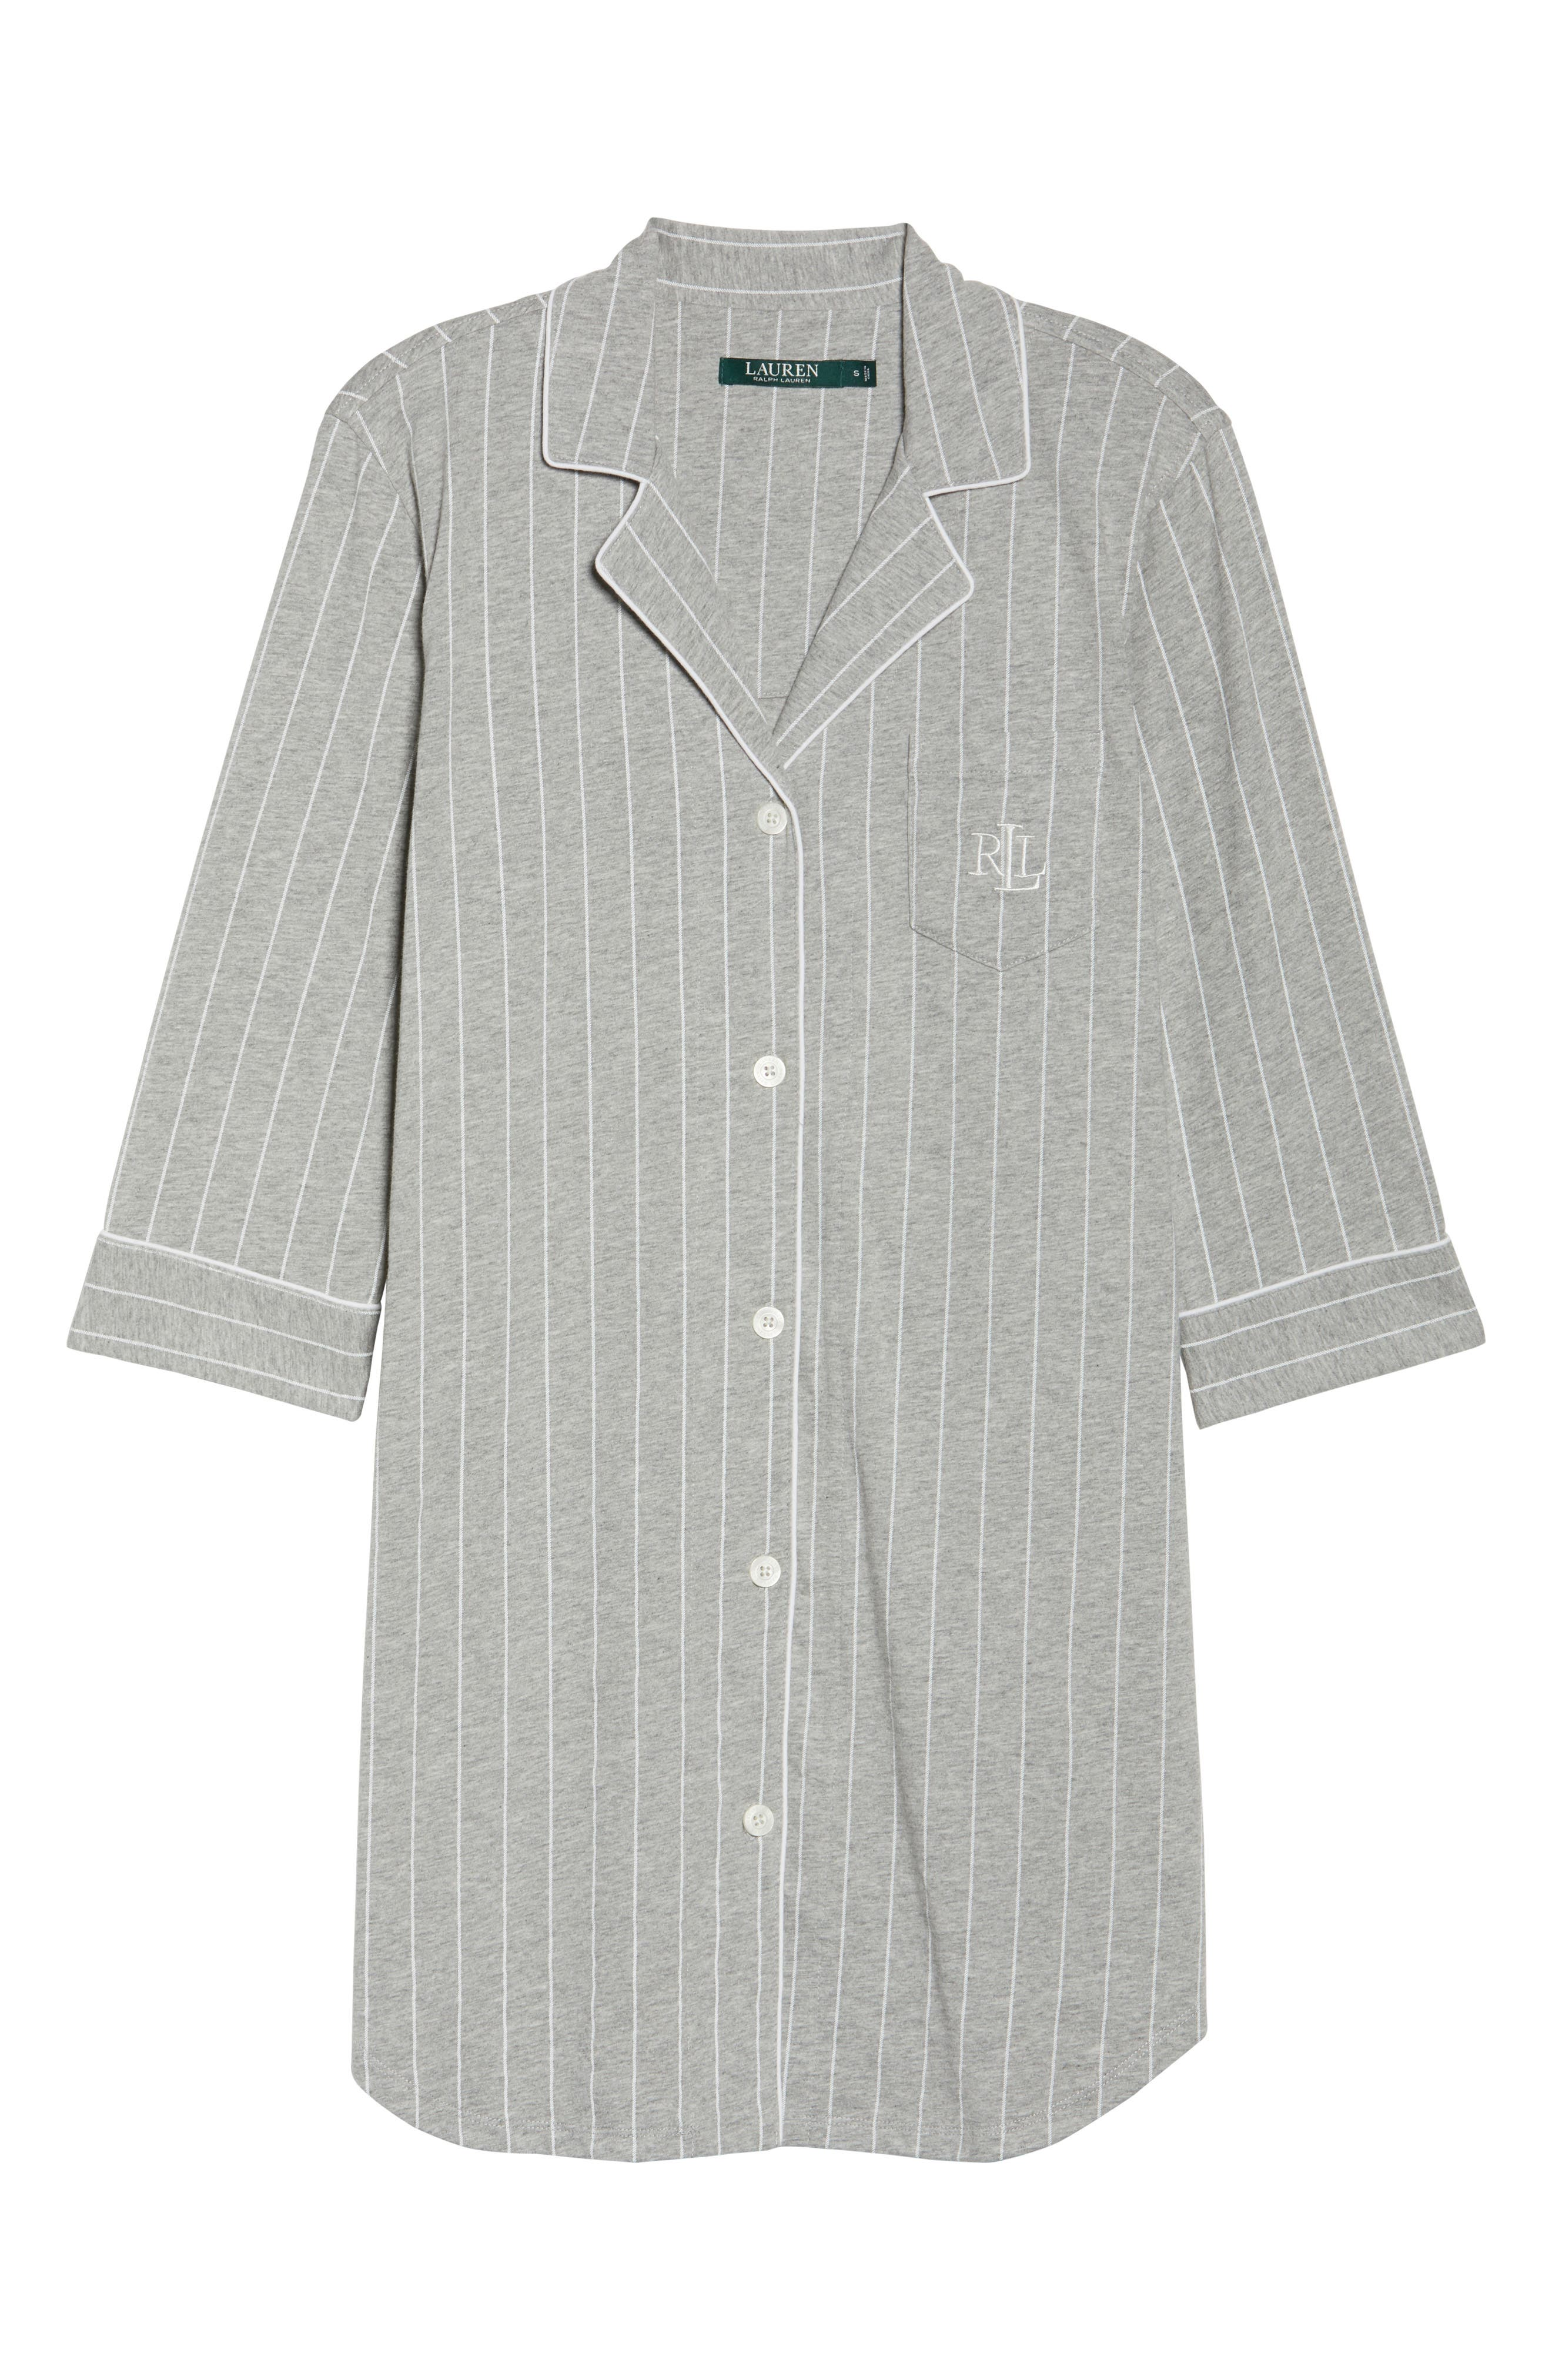 LAUREN RALPH LAUREN, Jersey Sleep Shirt, Alternate thumbnail 6, color, GREYSTONE